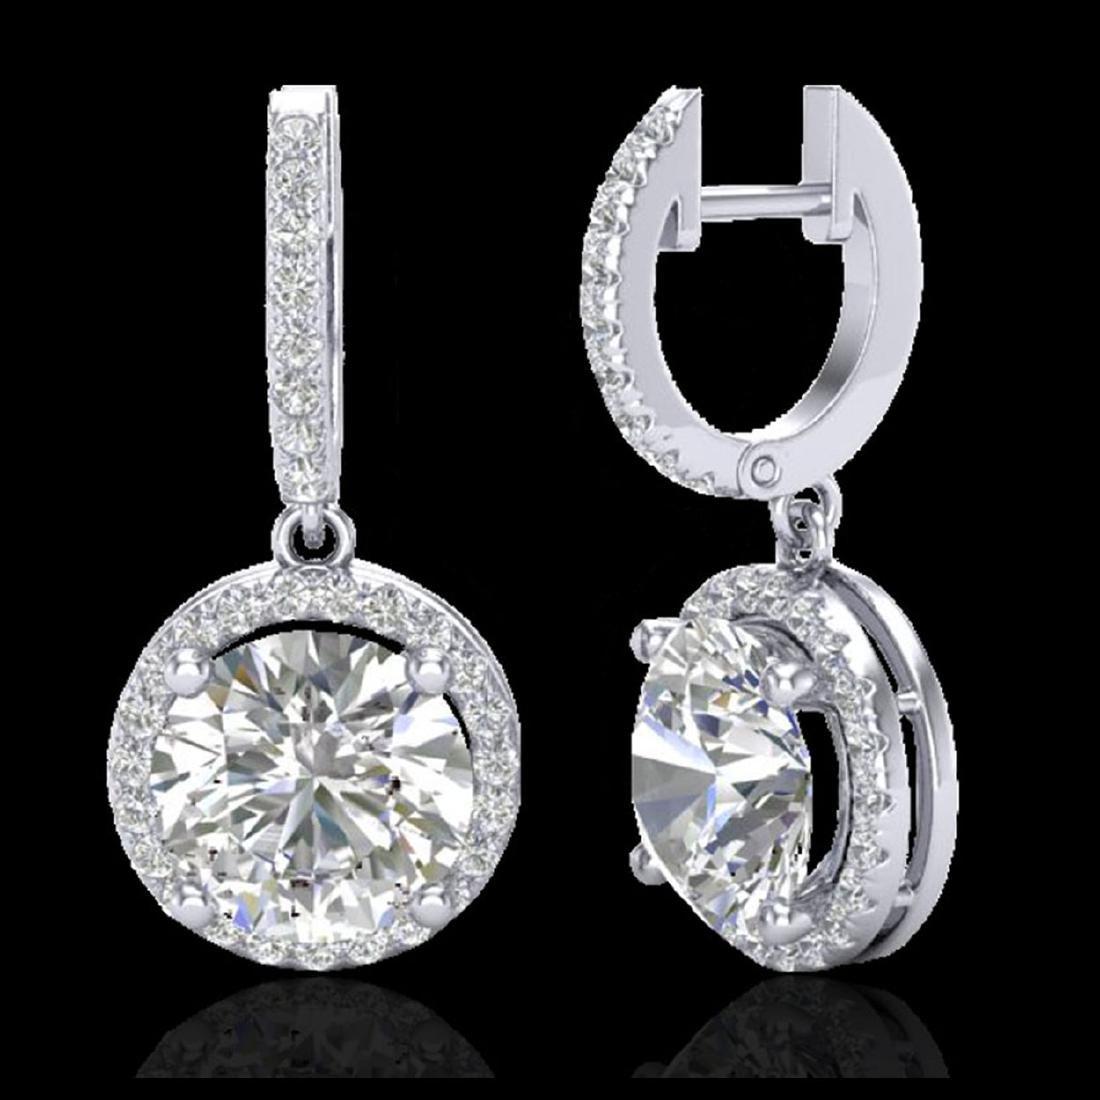 4.50 CTW VS/SI Diamond Halo 18K Gold - REF-1868G2N - - 2